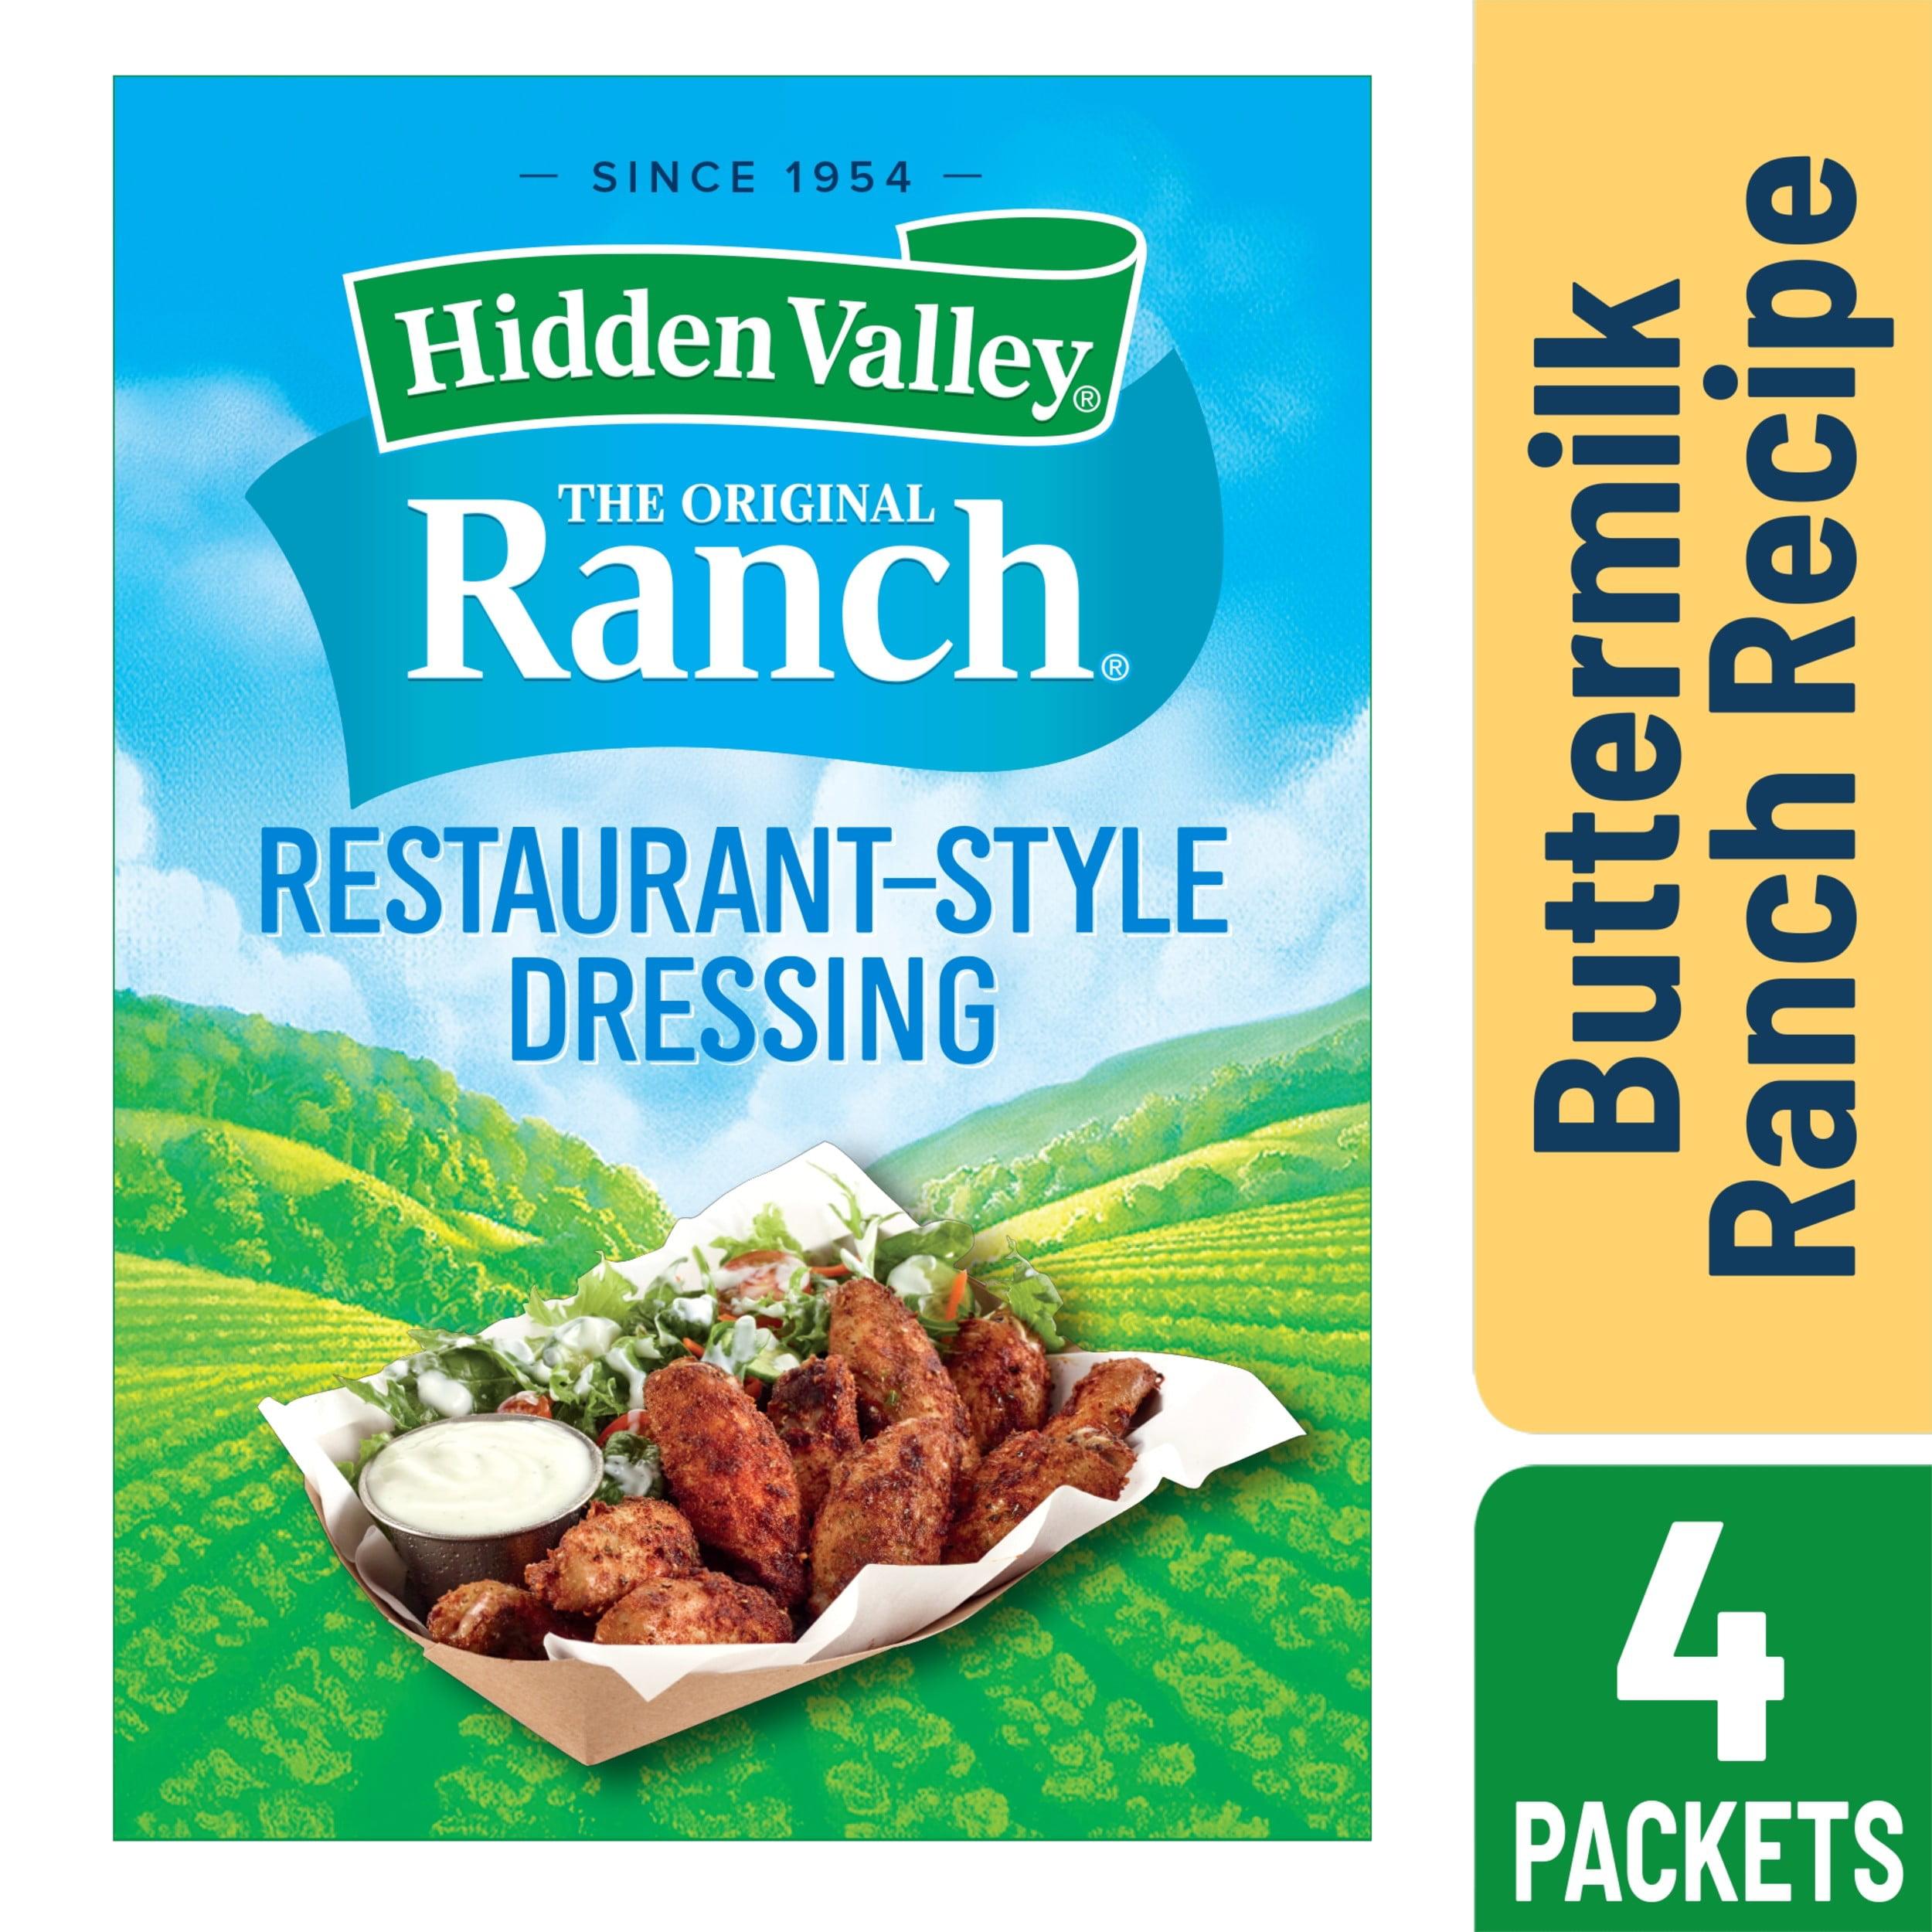 Hidden Valley Buttermilk Ranch Salad Dressing & Seasoning Mix, Gluten Free - 4 Packets